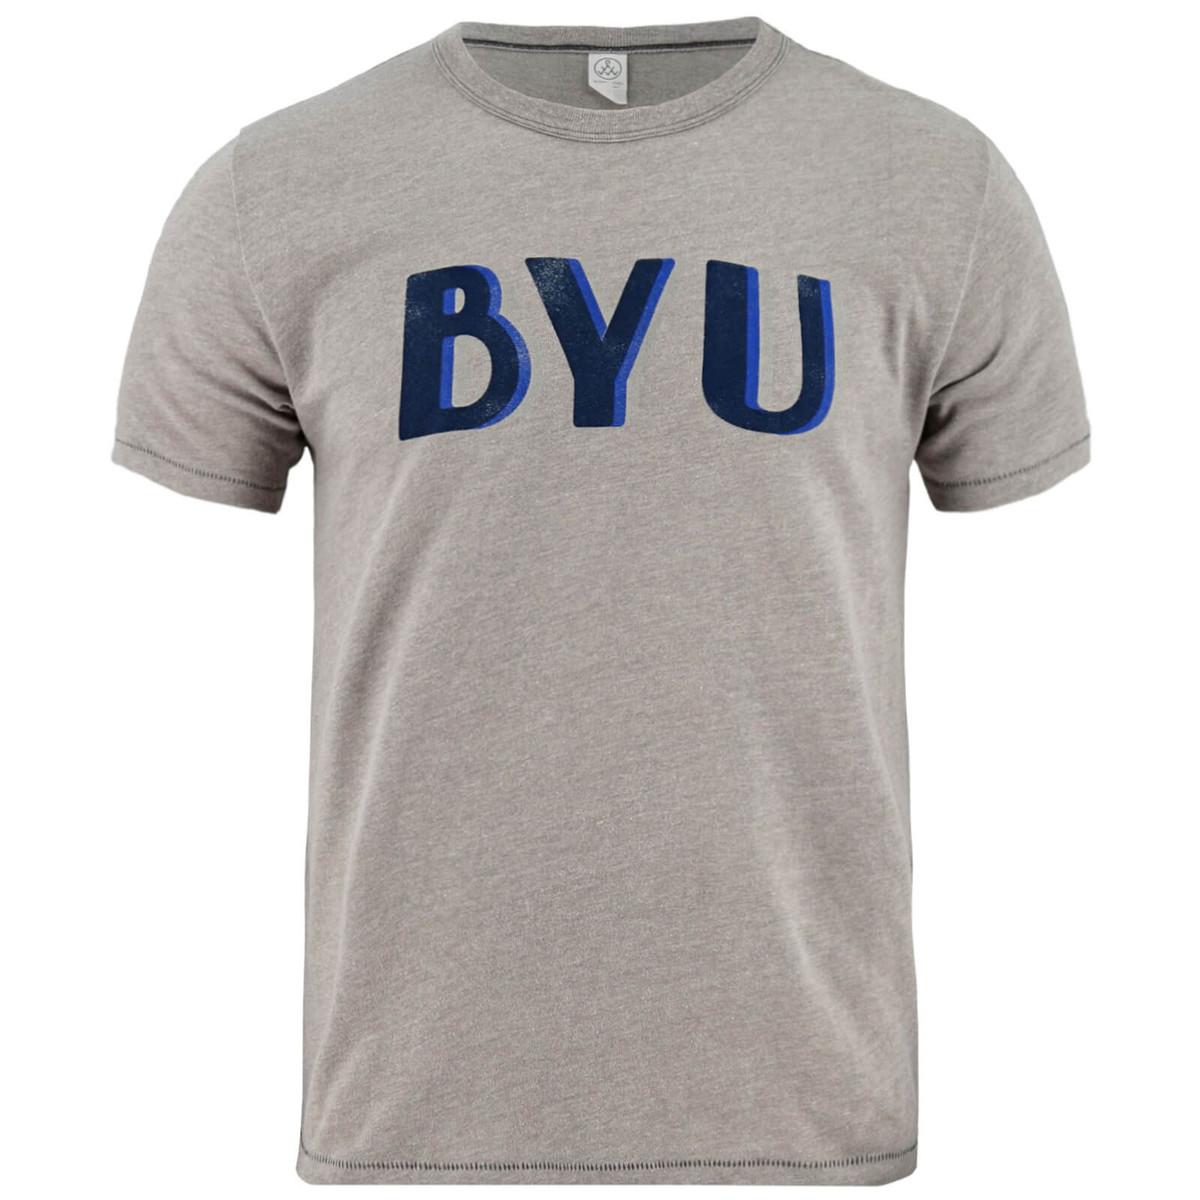 9b081f2e41 BYU T-Shirt - Alternative